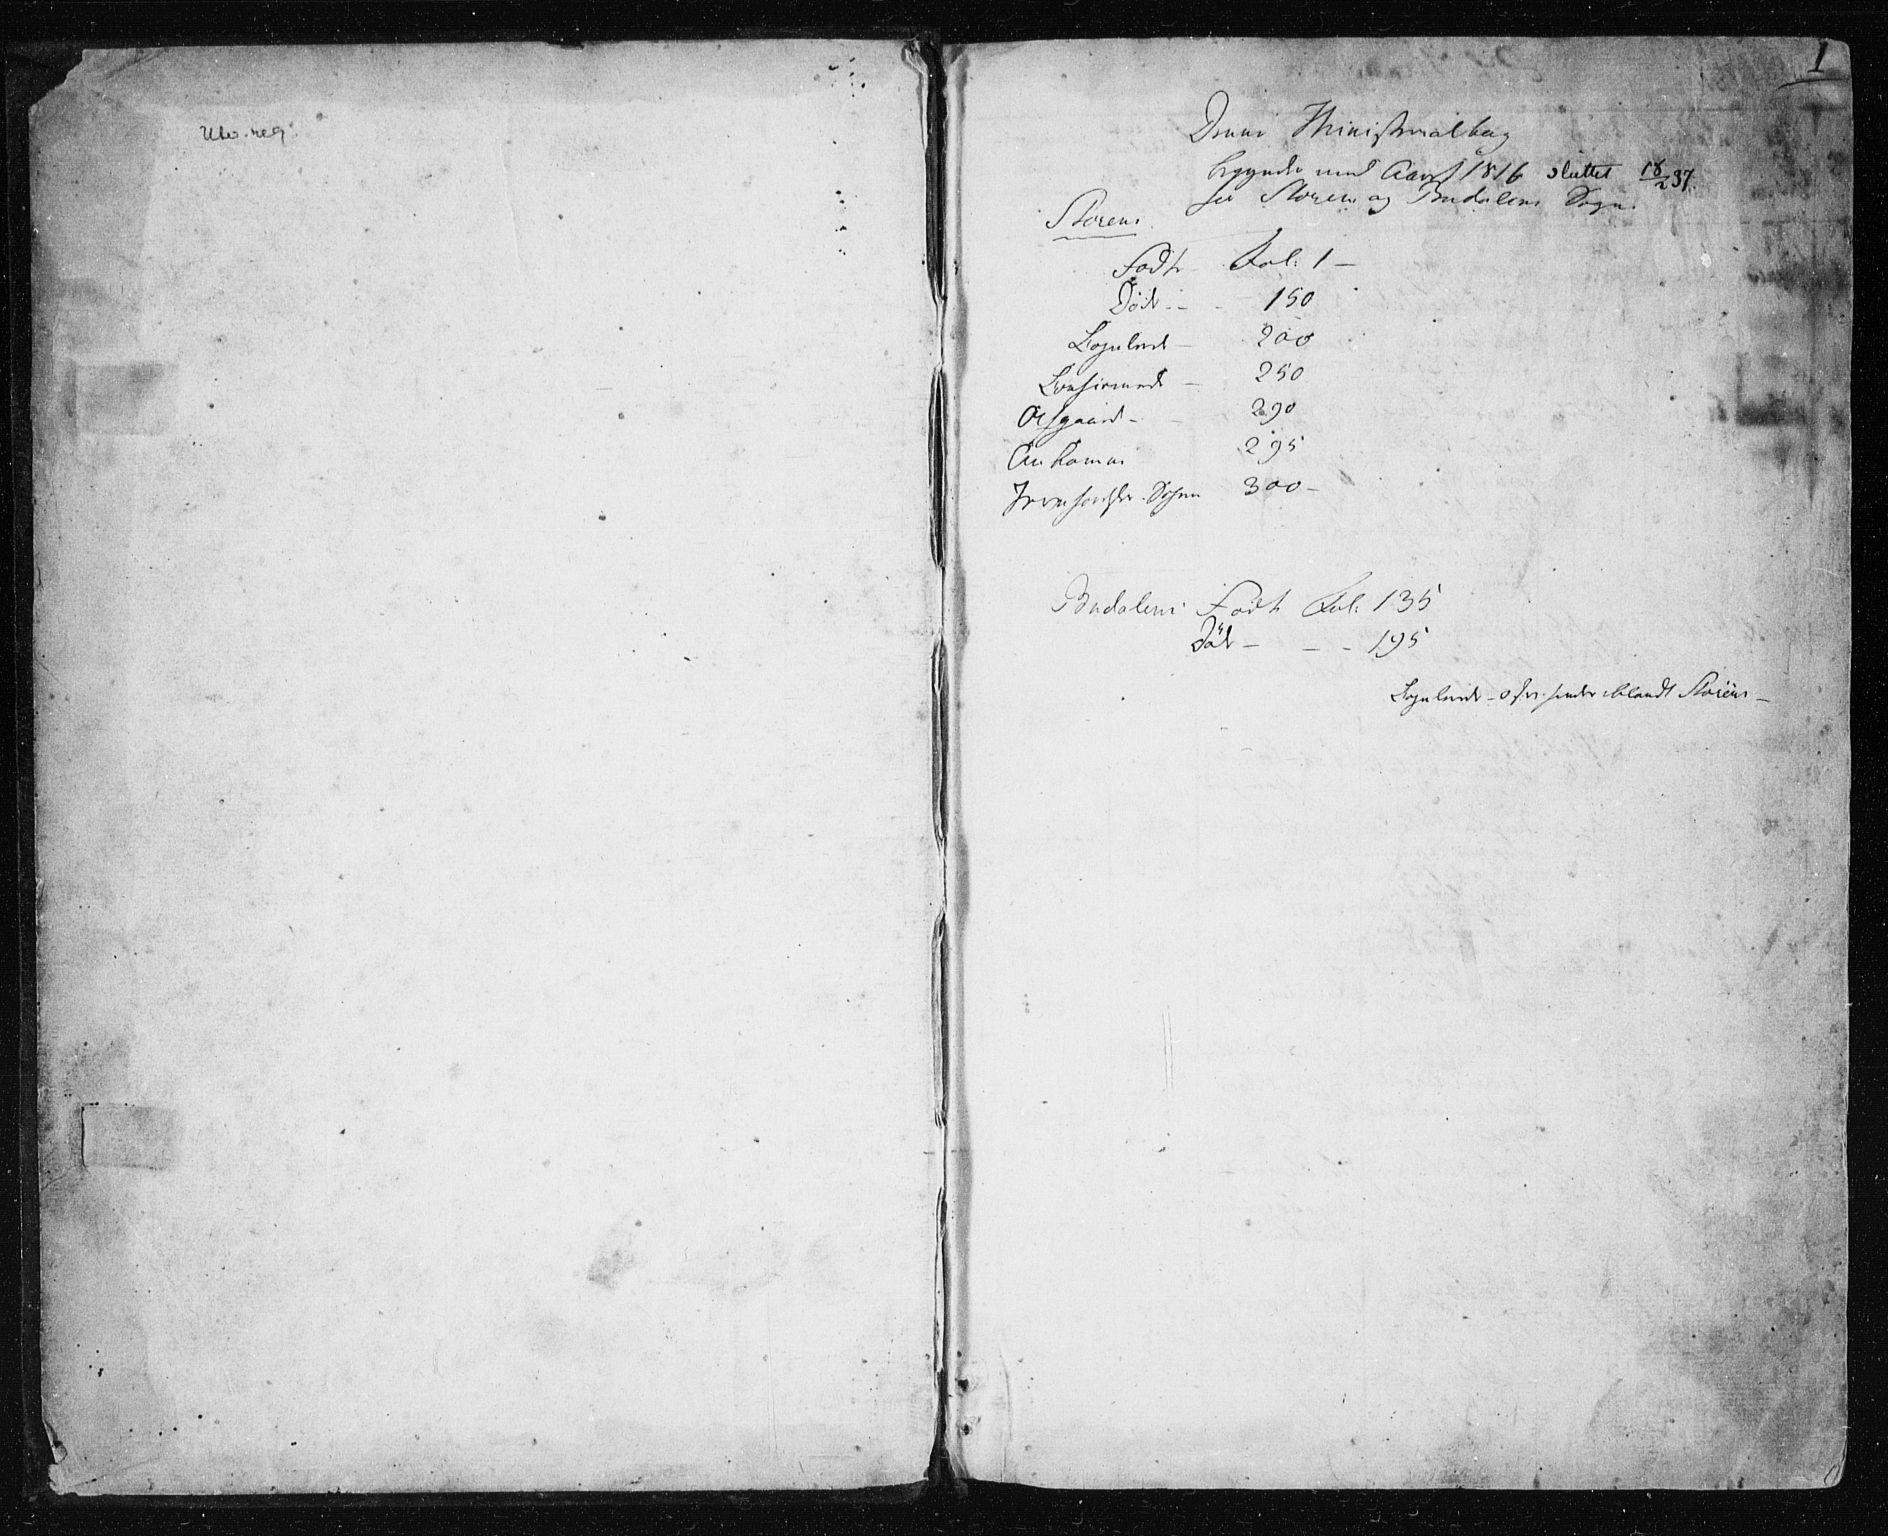 SAT, Ministerialprotokoller, klokkerbøker og fødselsregistre - Sør-Trøndelag, 687/L1017: Parish register (copy) no. 687C01, 1816-1837, p. 1